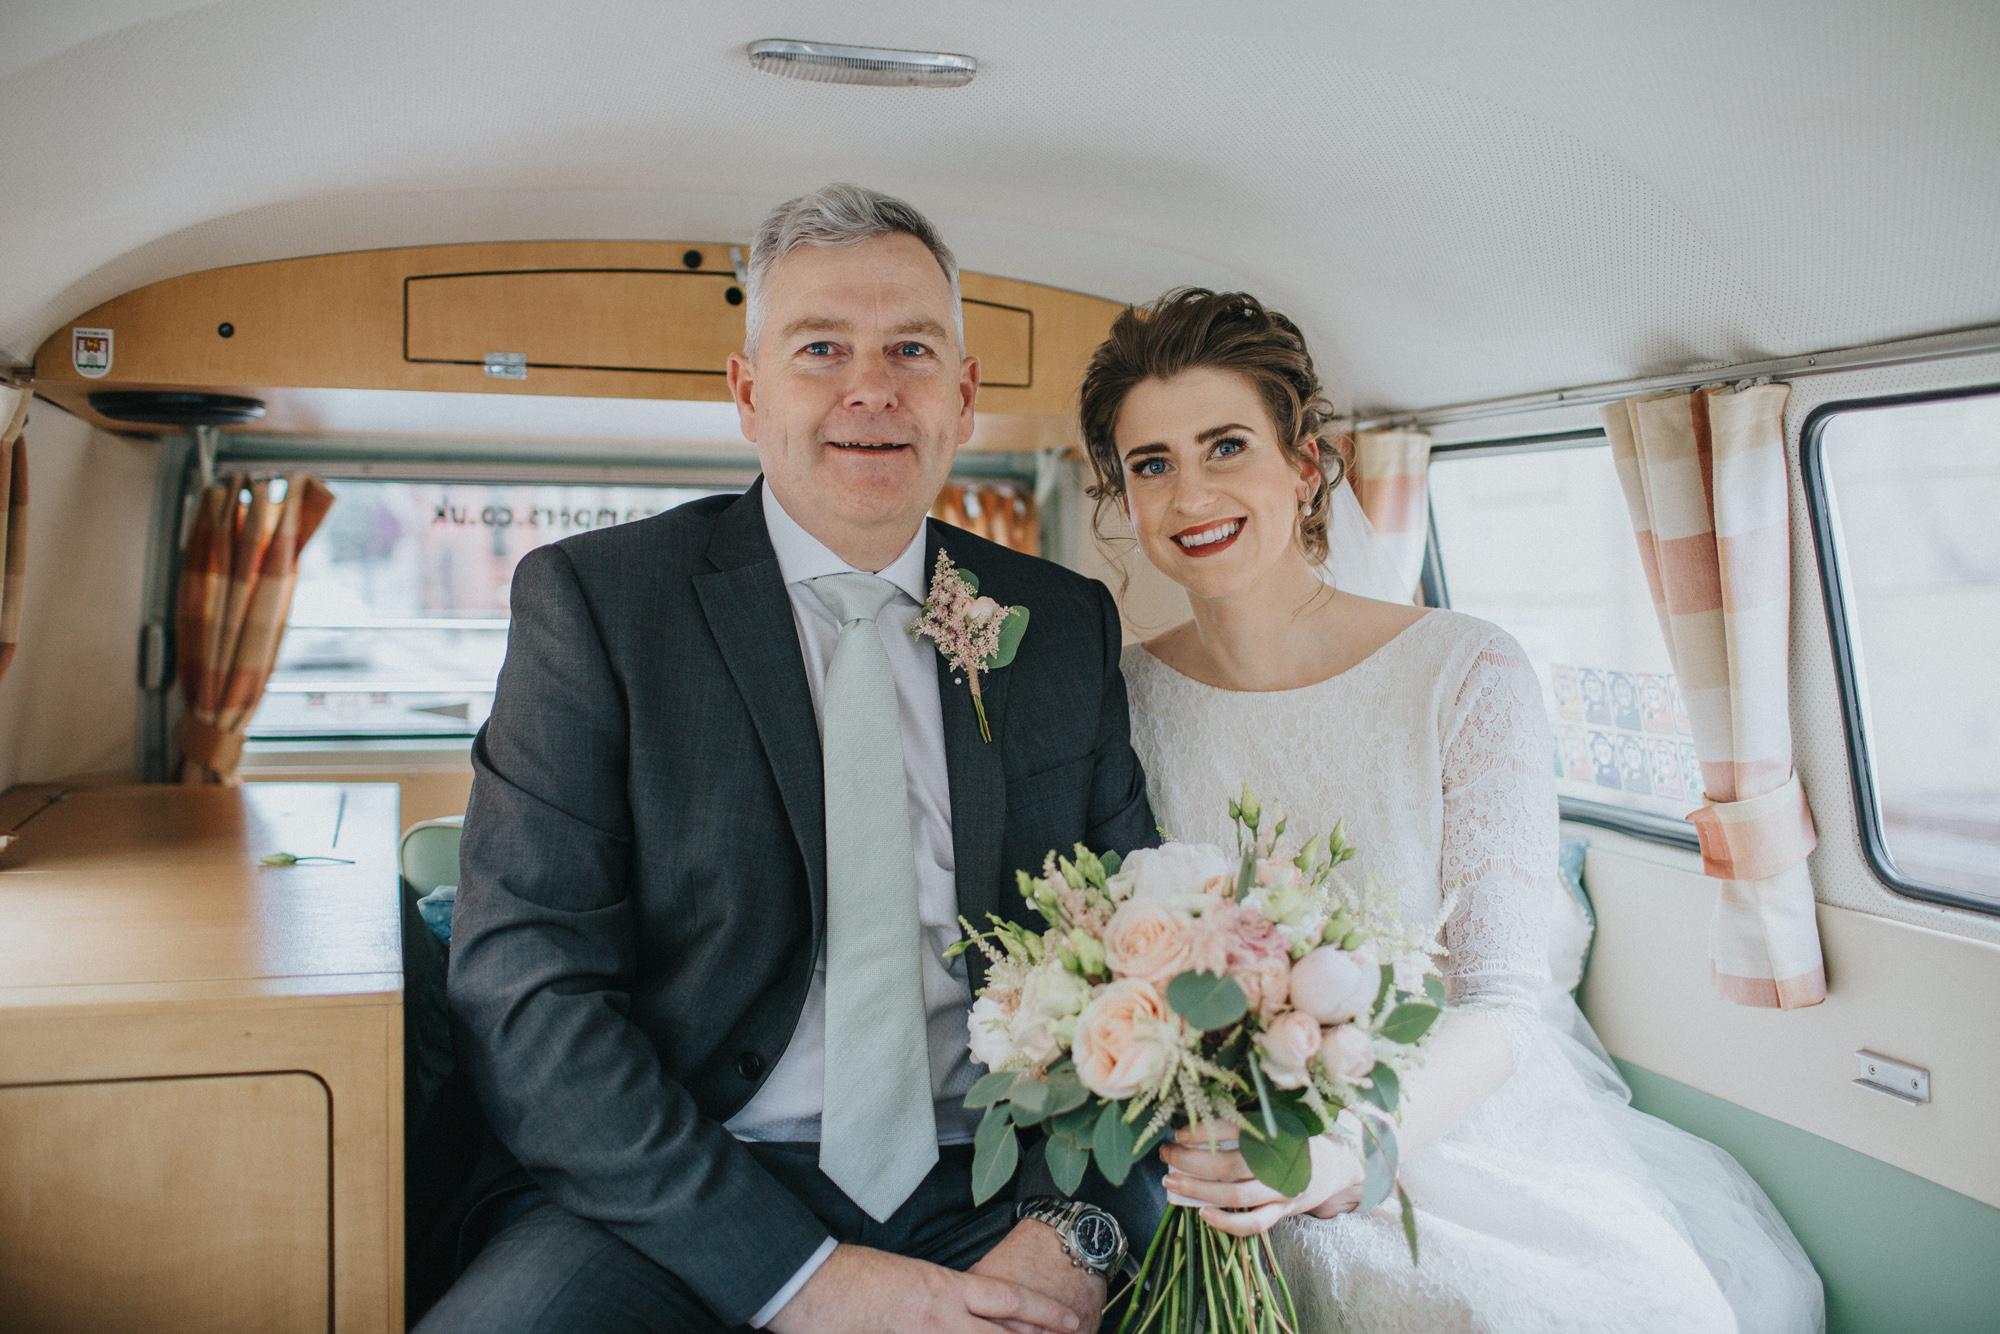 Kate-Beaumont-Lace-Flared-Dahlia-Gown-Leeds-Wedding-Bloom-Weddings-12.jpg